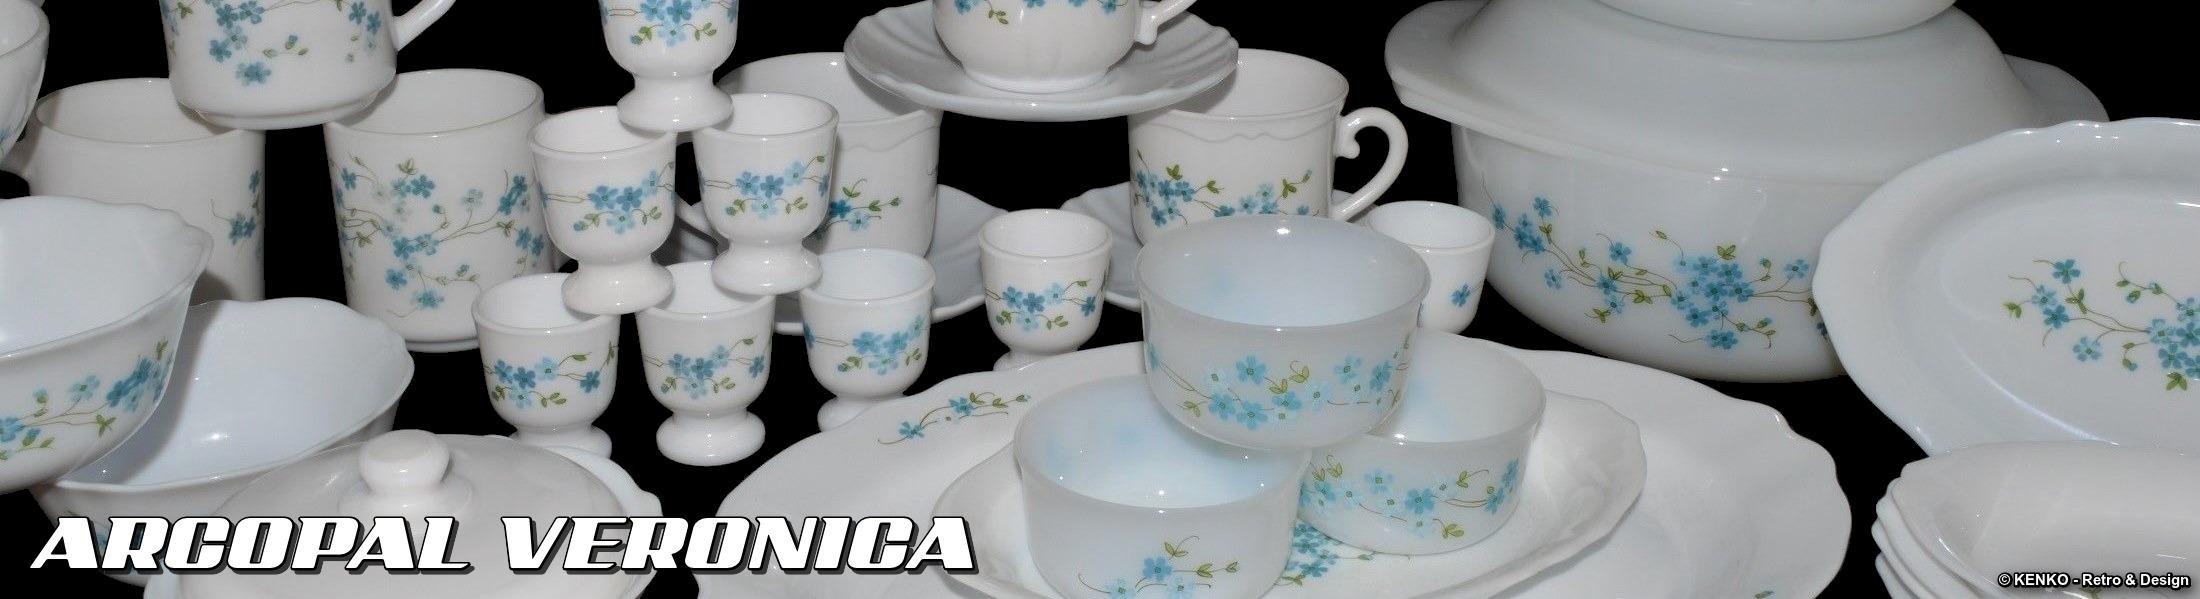 Arcopal Veronica